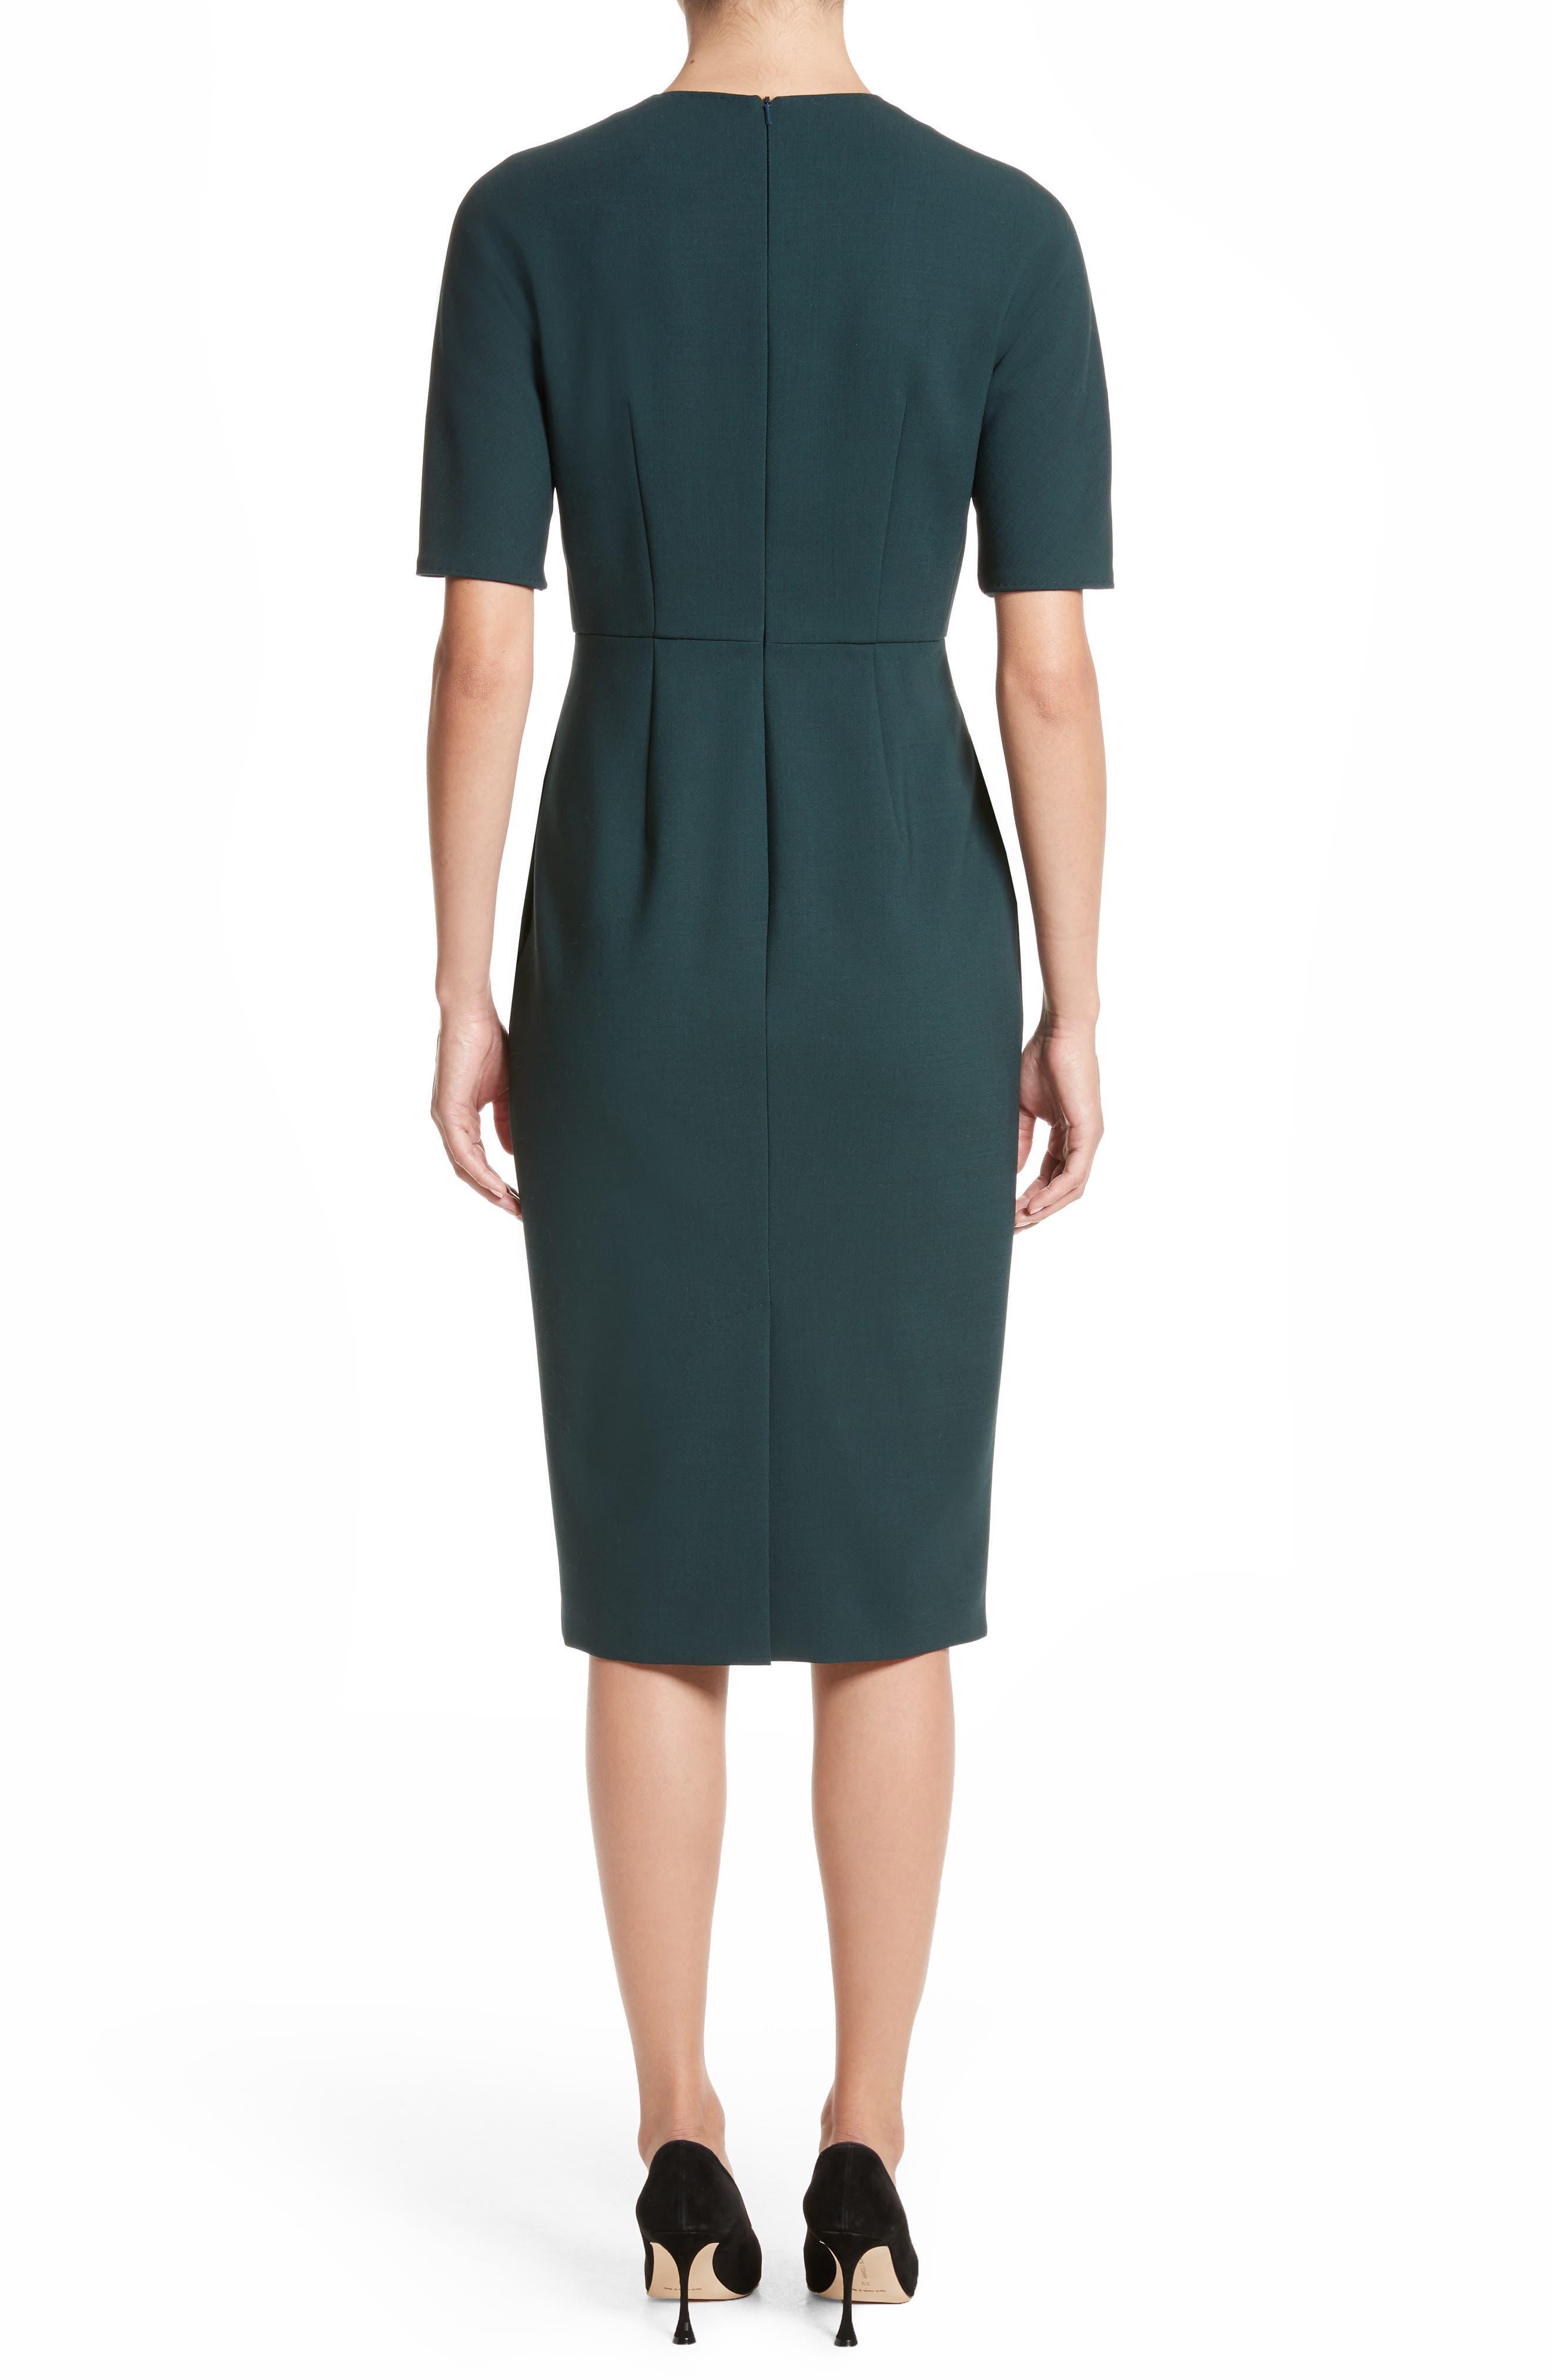 Umano Stretch Wool Sheath Dress,                             Alternate thumbnail 2, color,                             304